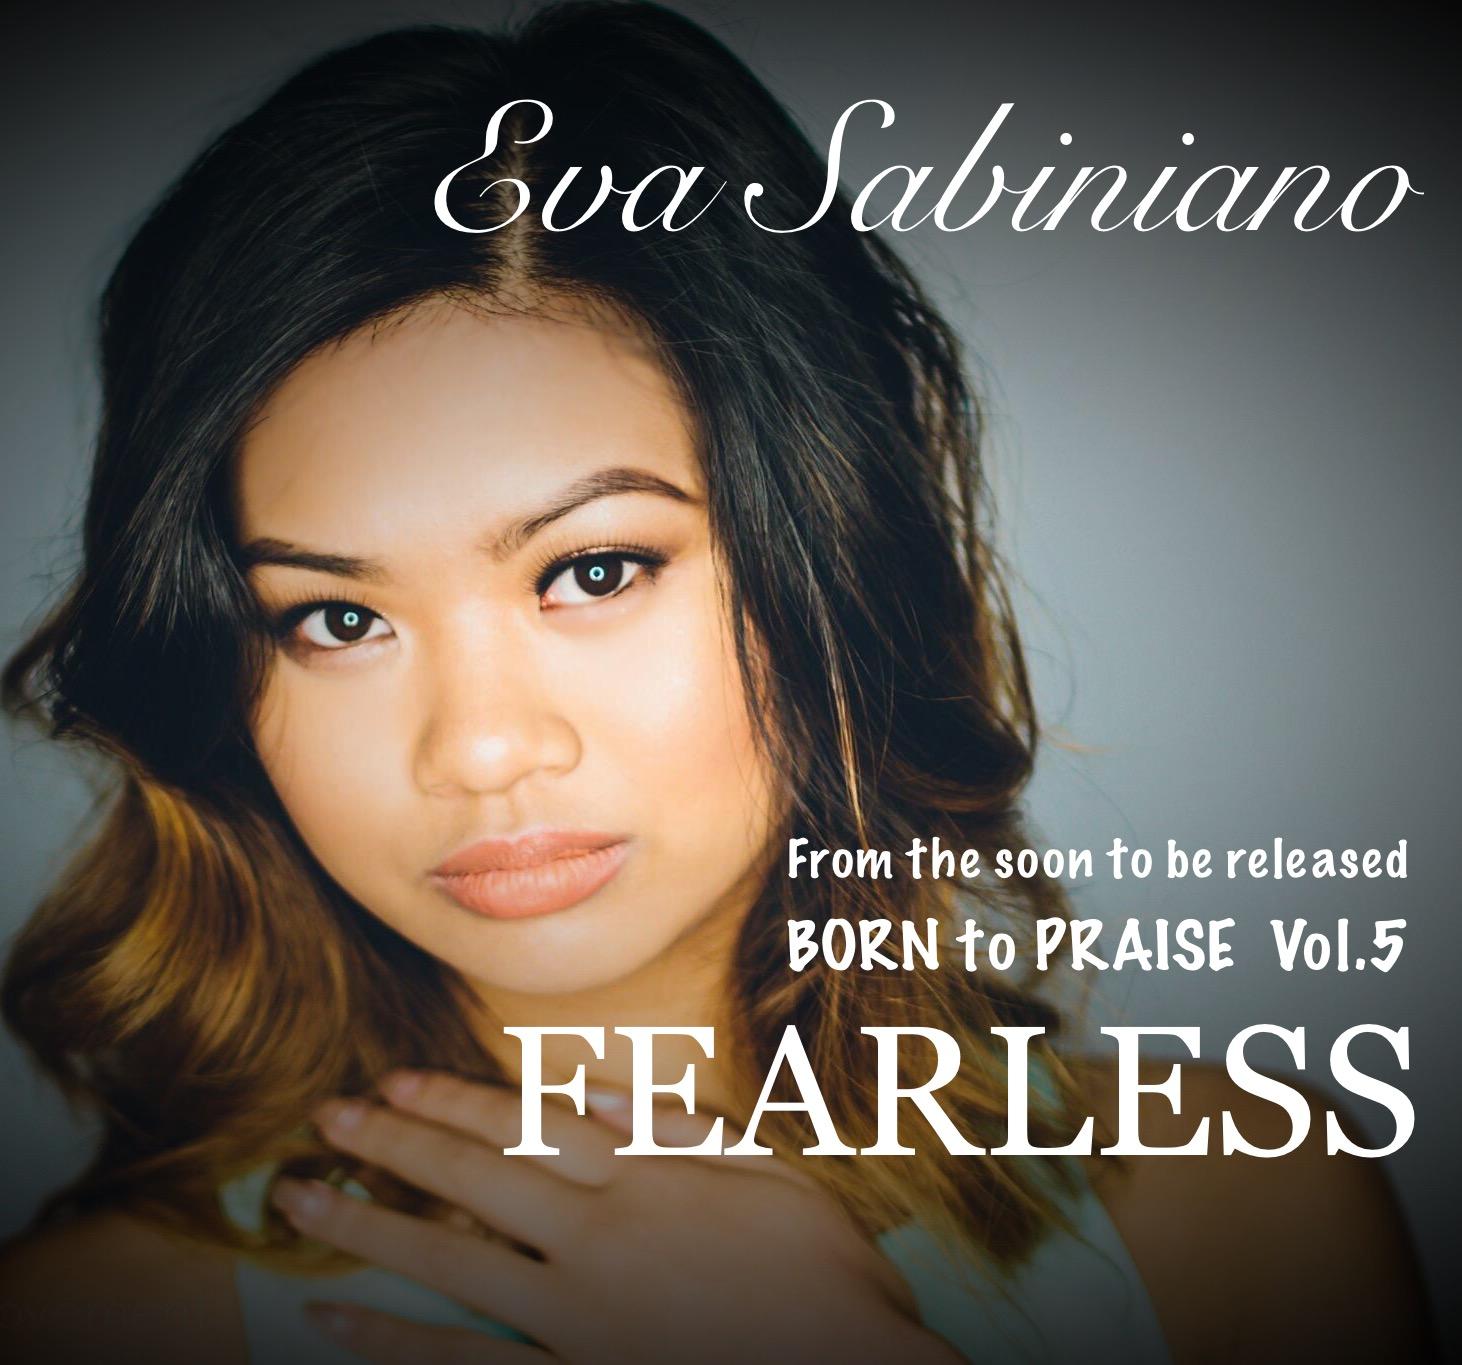 Fearless - Eve Saviniano